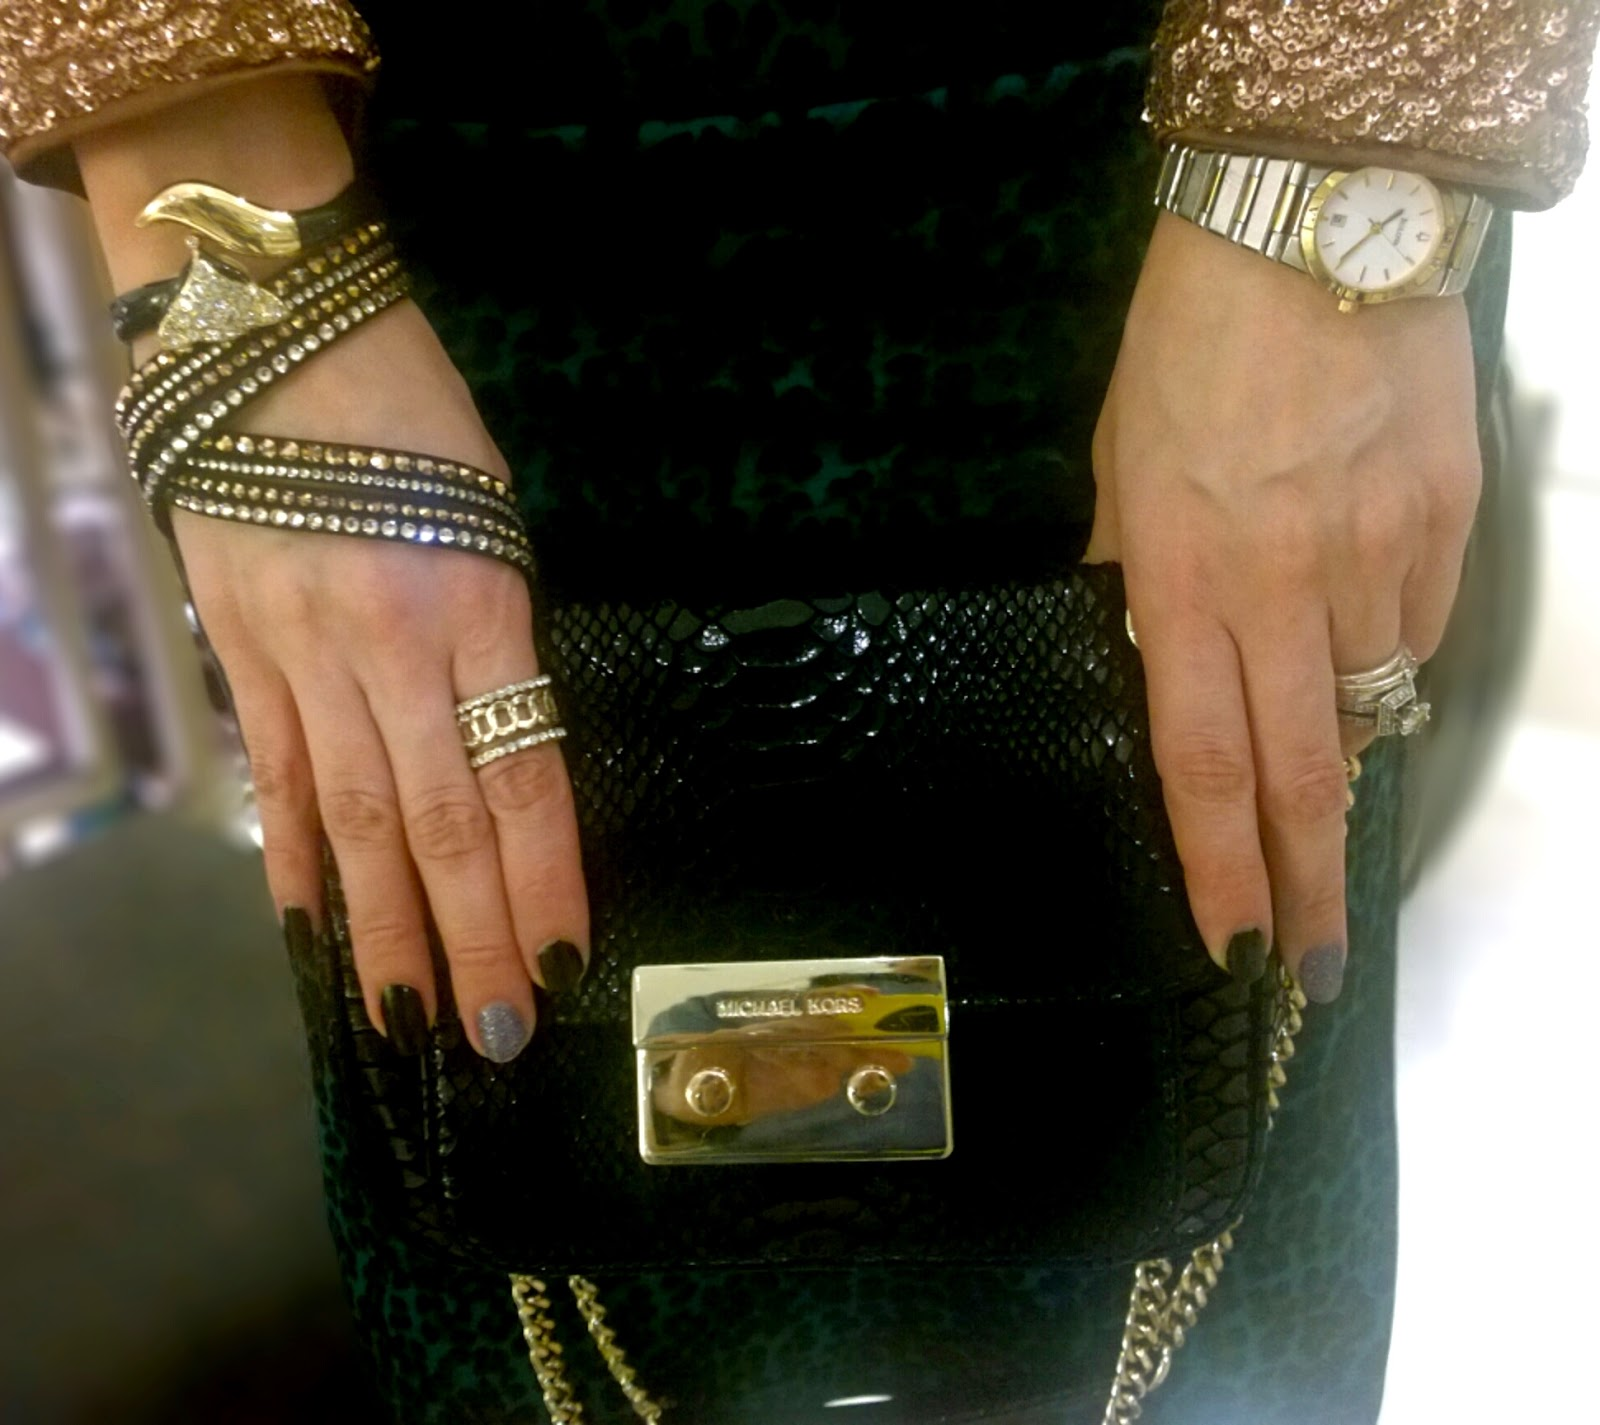 Michael Kors Black Patent Python Small Sloan Shoulder Flap Bag, Swarovski Slake Bracelet